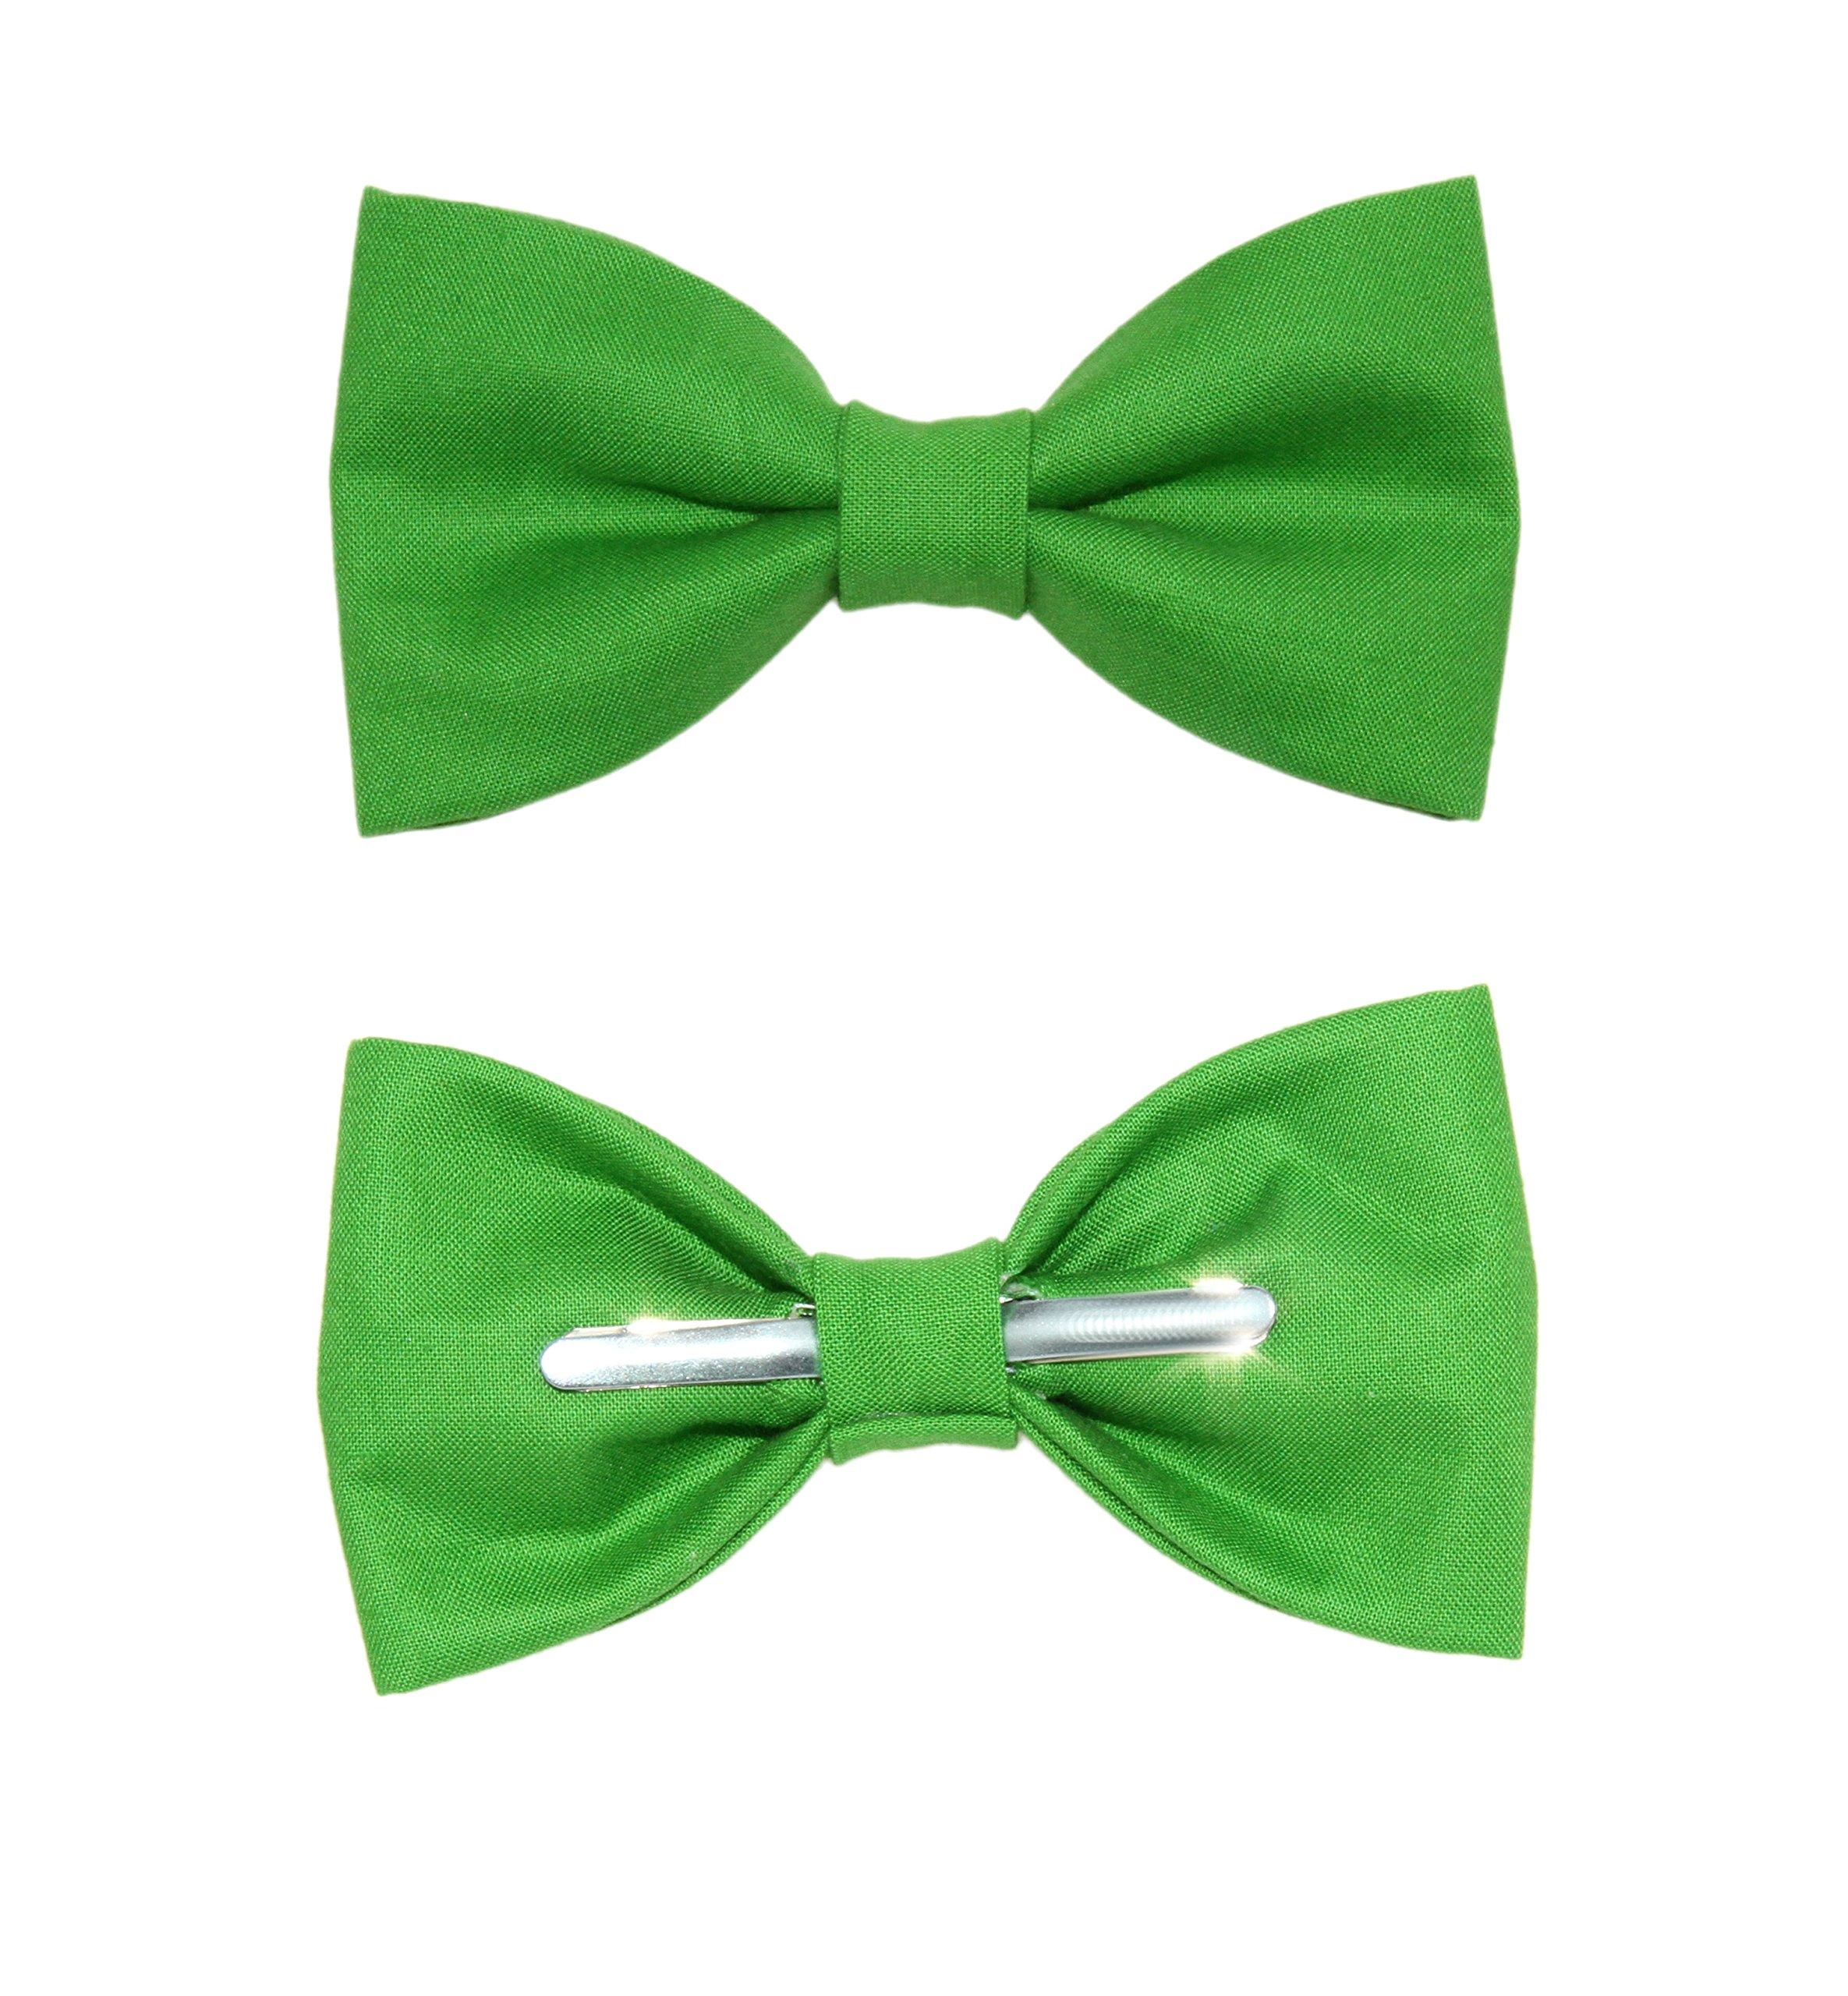 Toddler Boy 4T 5T Grasshopper Green Clip On Cotton Bow Tie